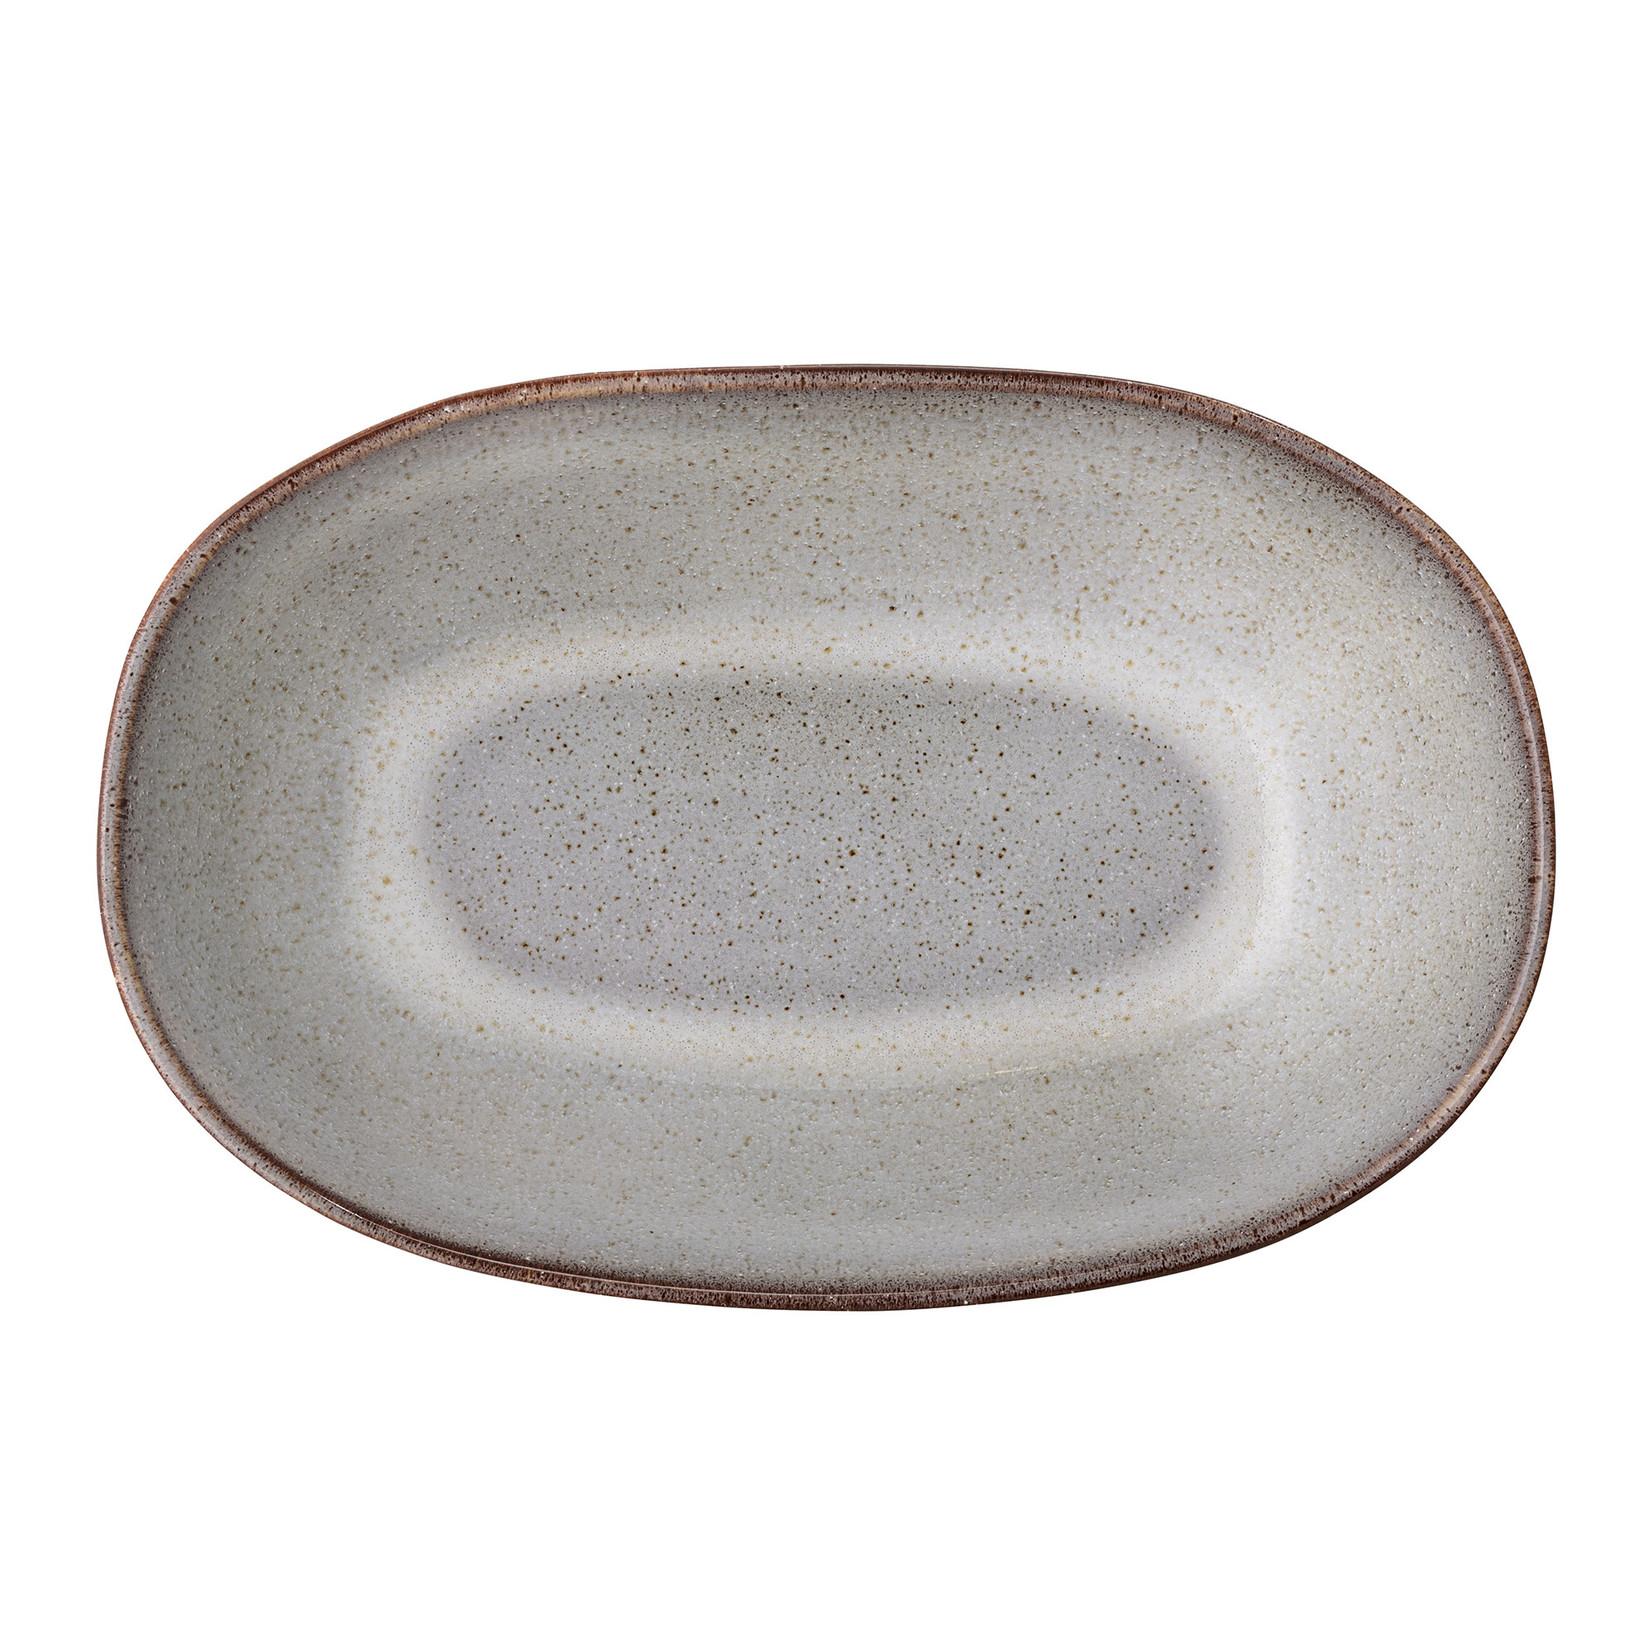 Bloomingville  Sandrine Serving Bowl, Grey, Stoneware